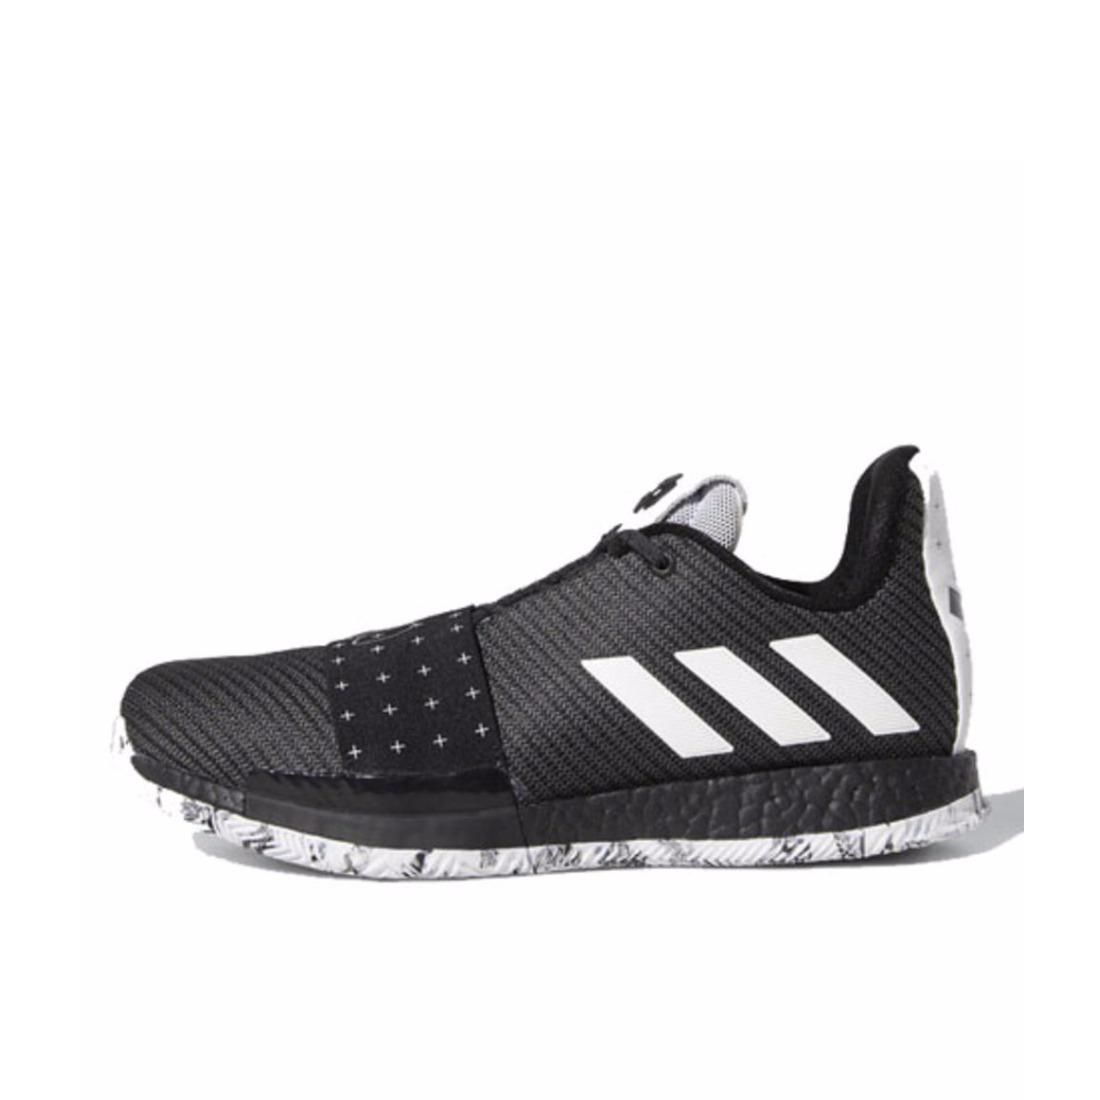 adidas 阿迪达斯 adidas Harden Vol.3 篮球鞋